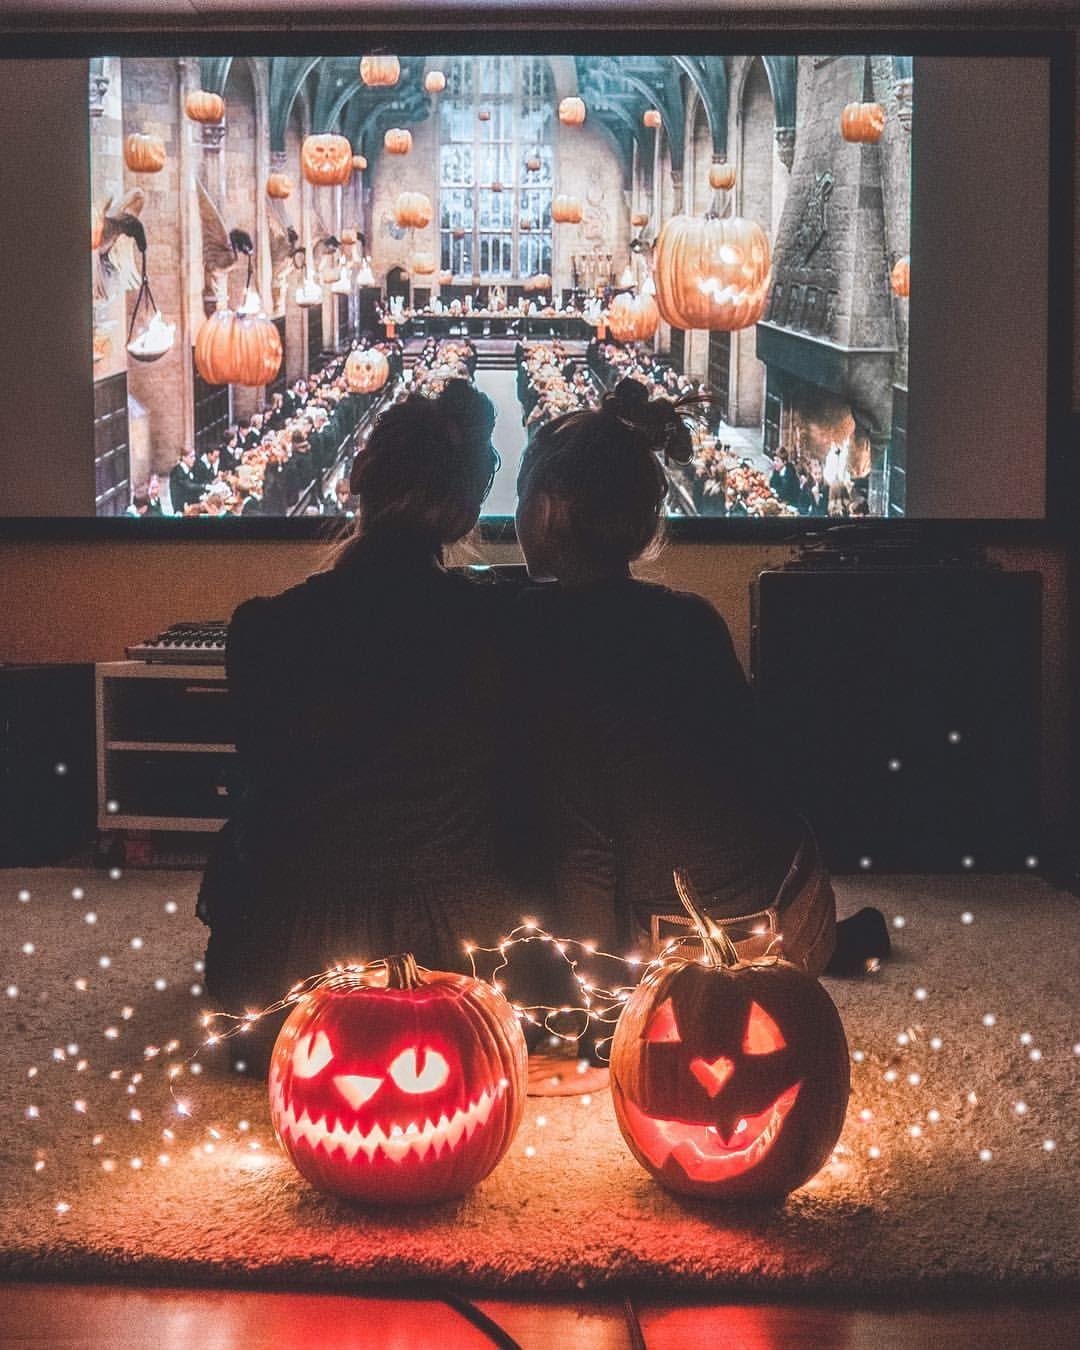 Elisa Sophie Auf Instagram Movie Nights With You Are My Favorites Harrypotte Halloween Movie Night Harry Potter Movie Night Fall Halloween